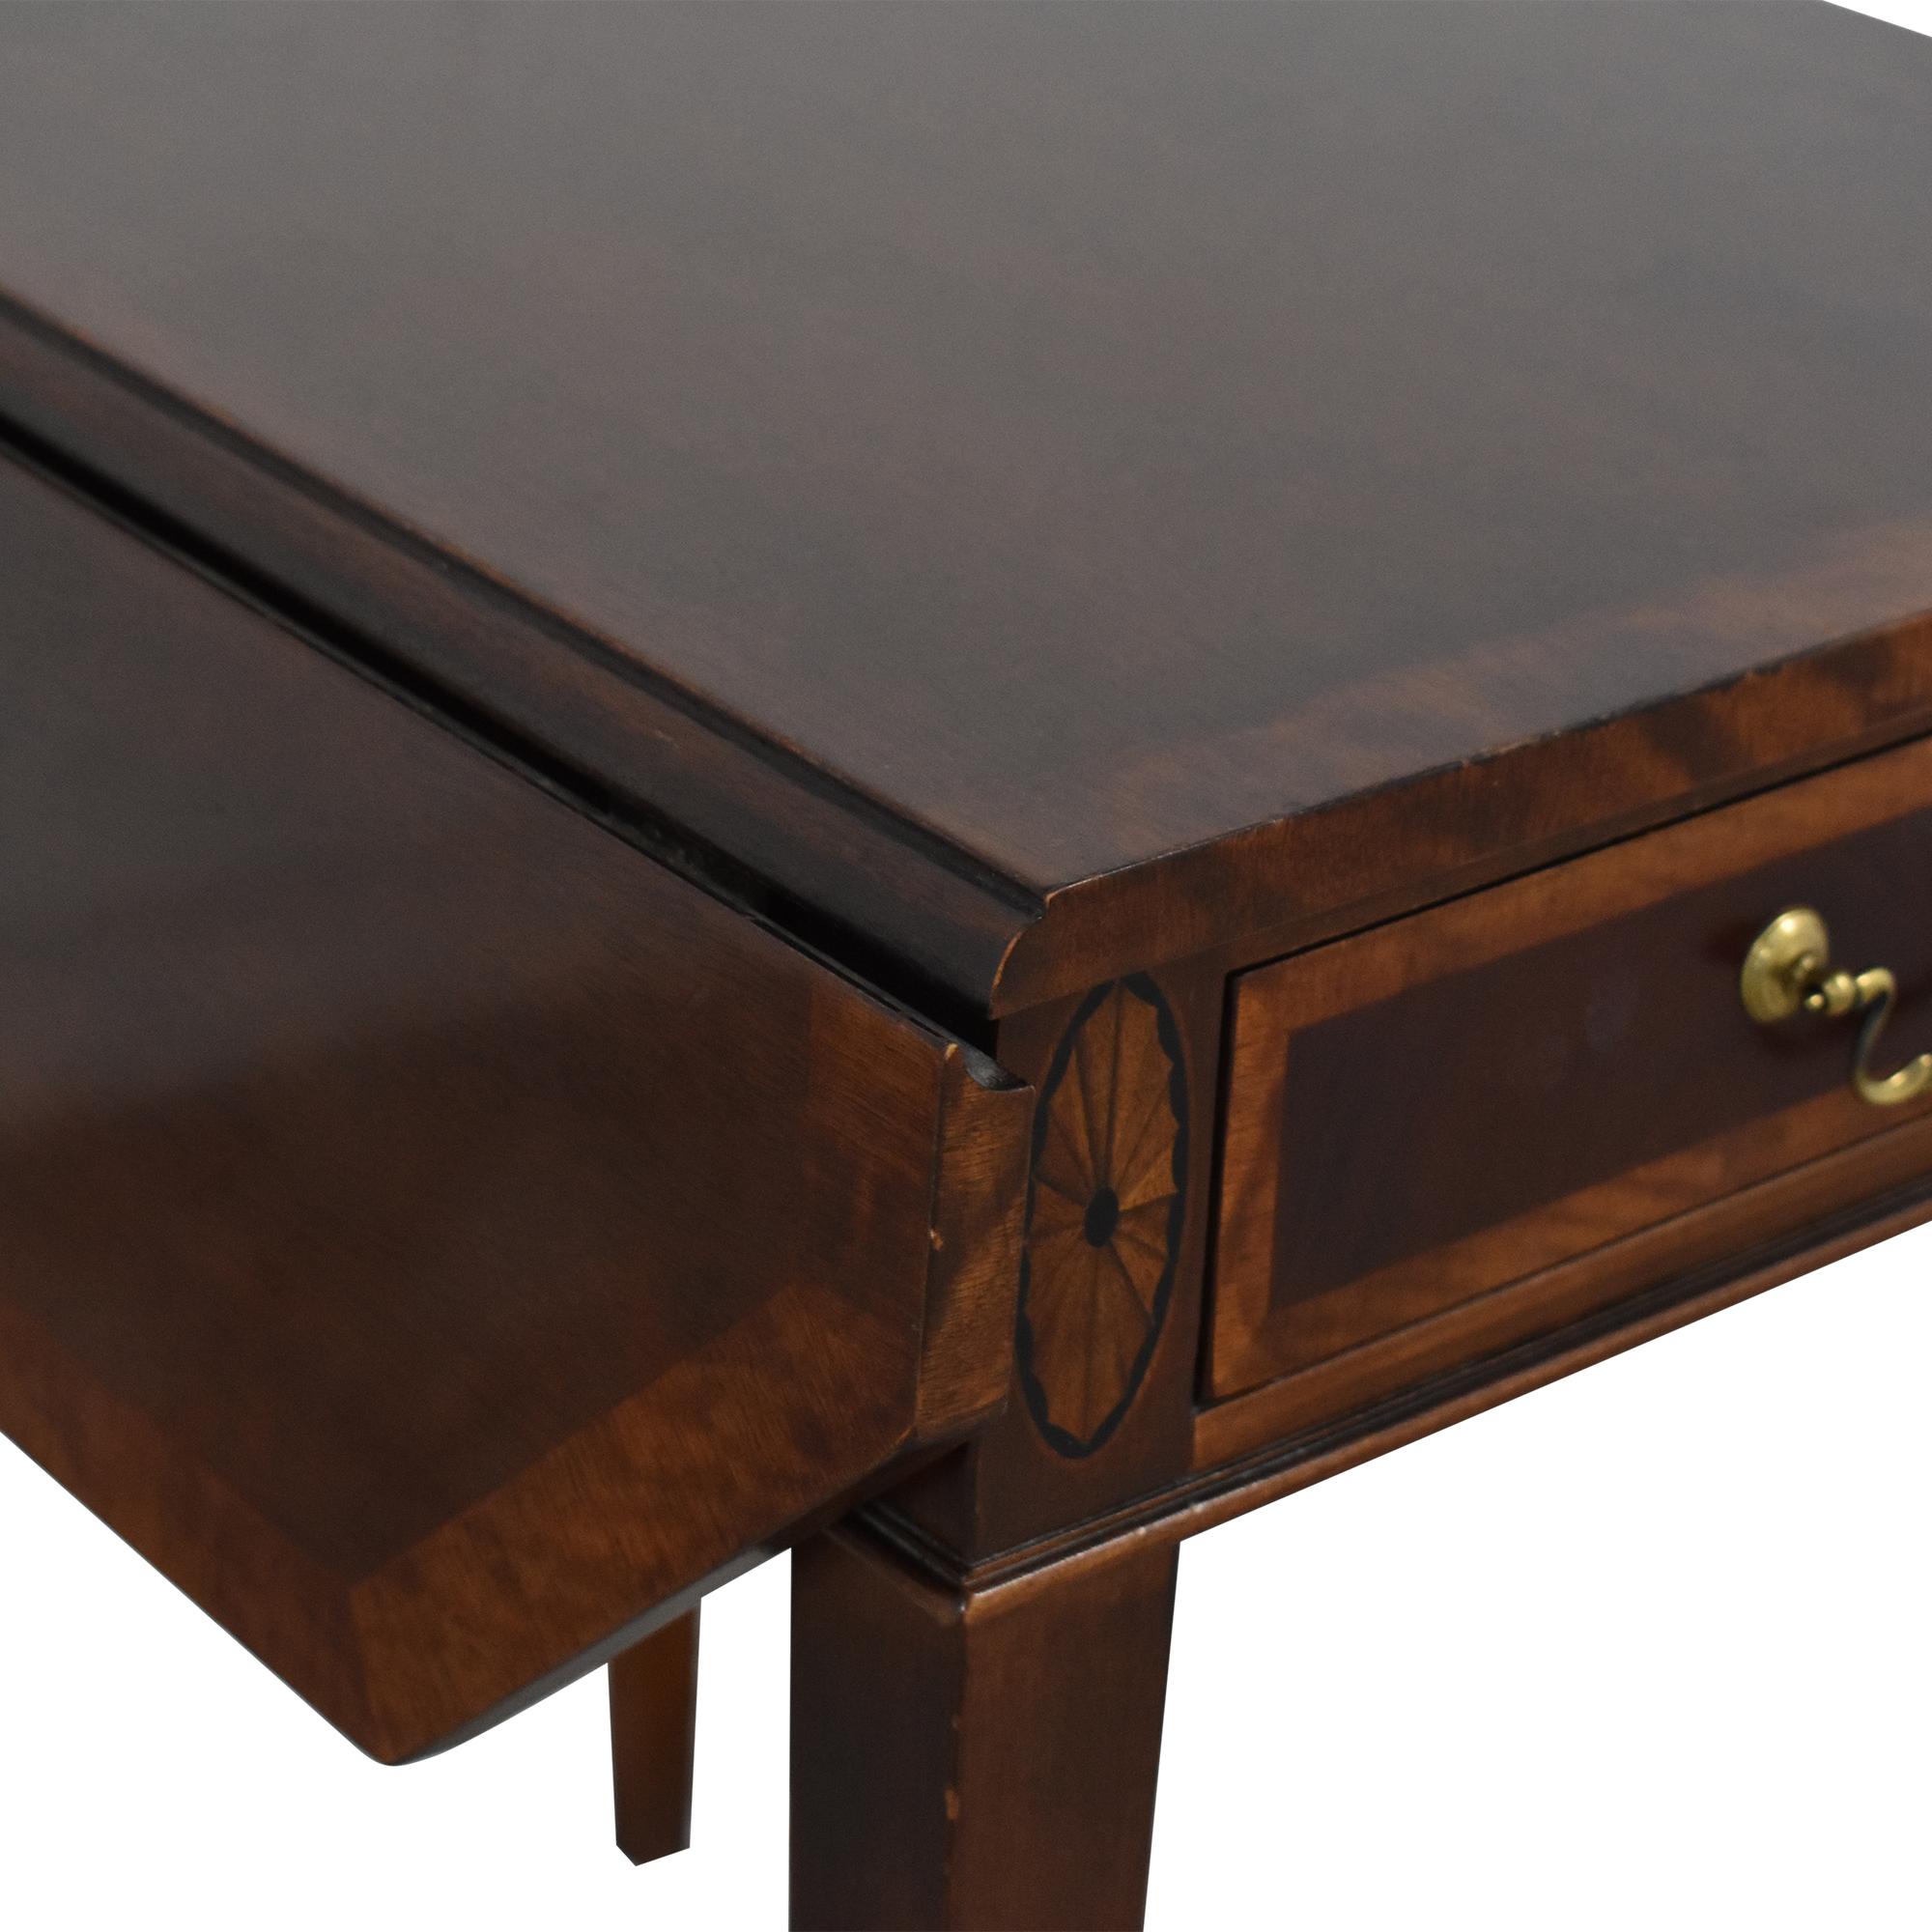 Henredon Furniture Henredon Drop Leaf Accent Table Tables